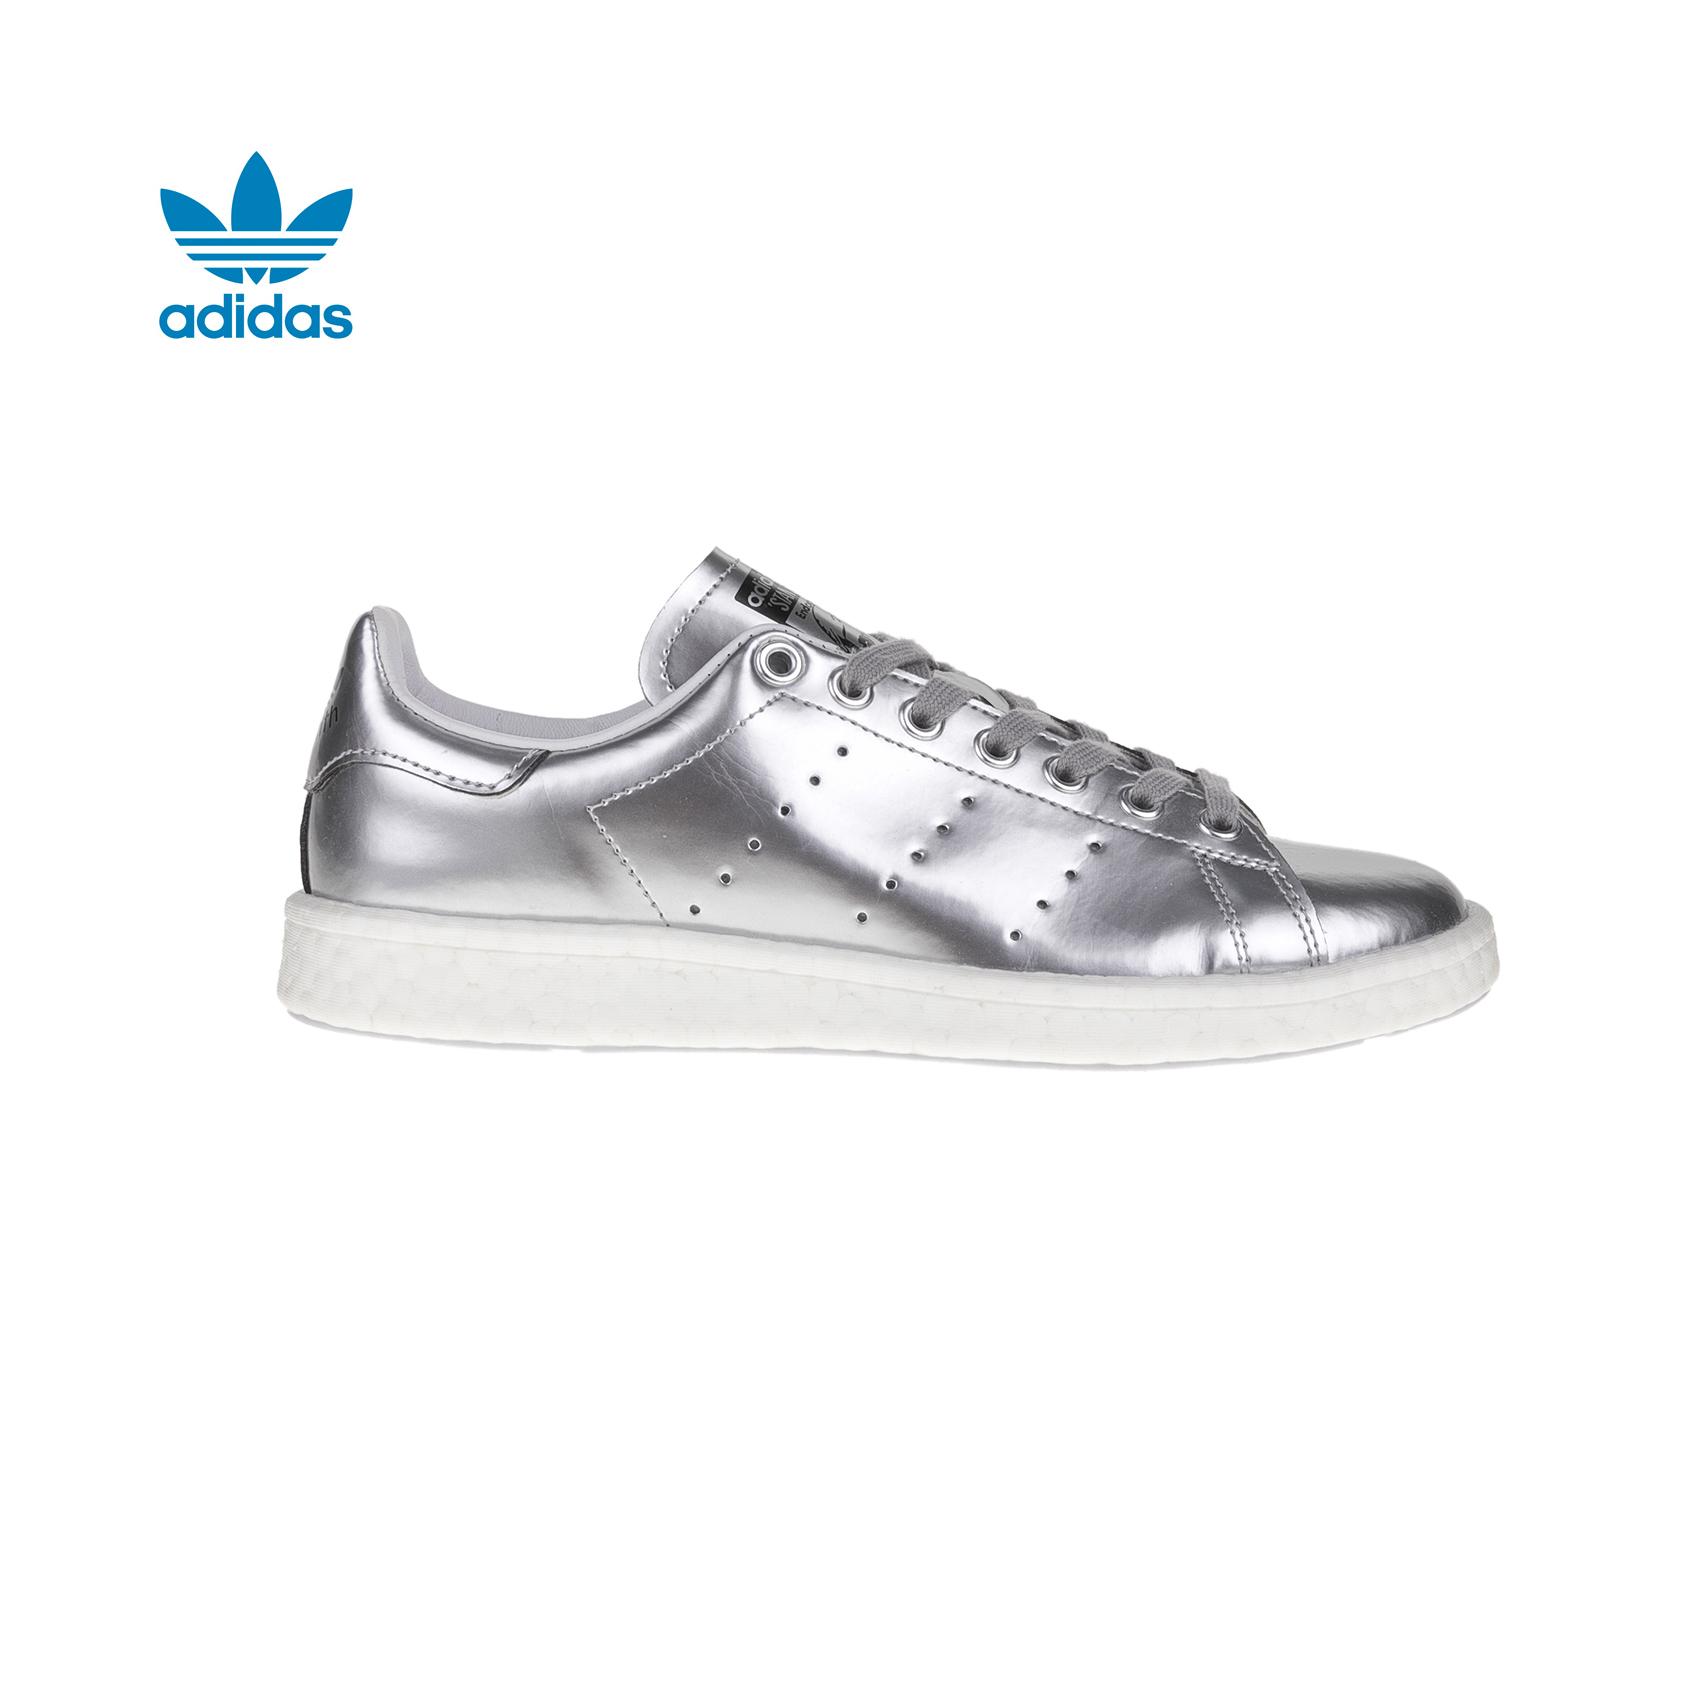 adidas Originals – Γυναικεία sneakers adidas STAN SMITH ασημί